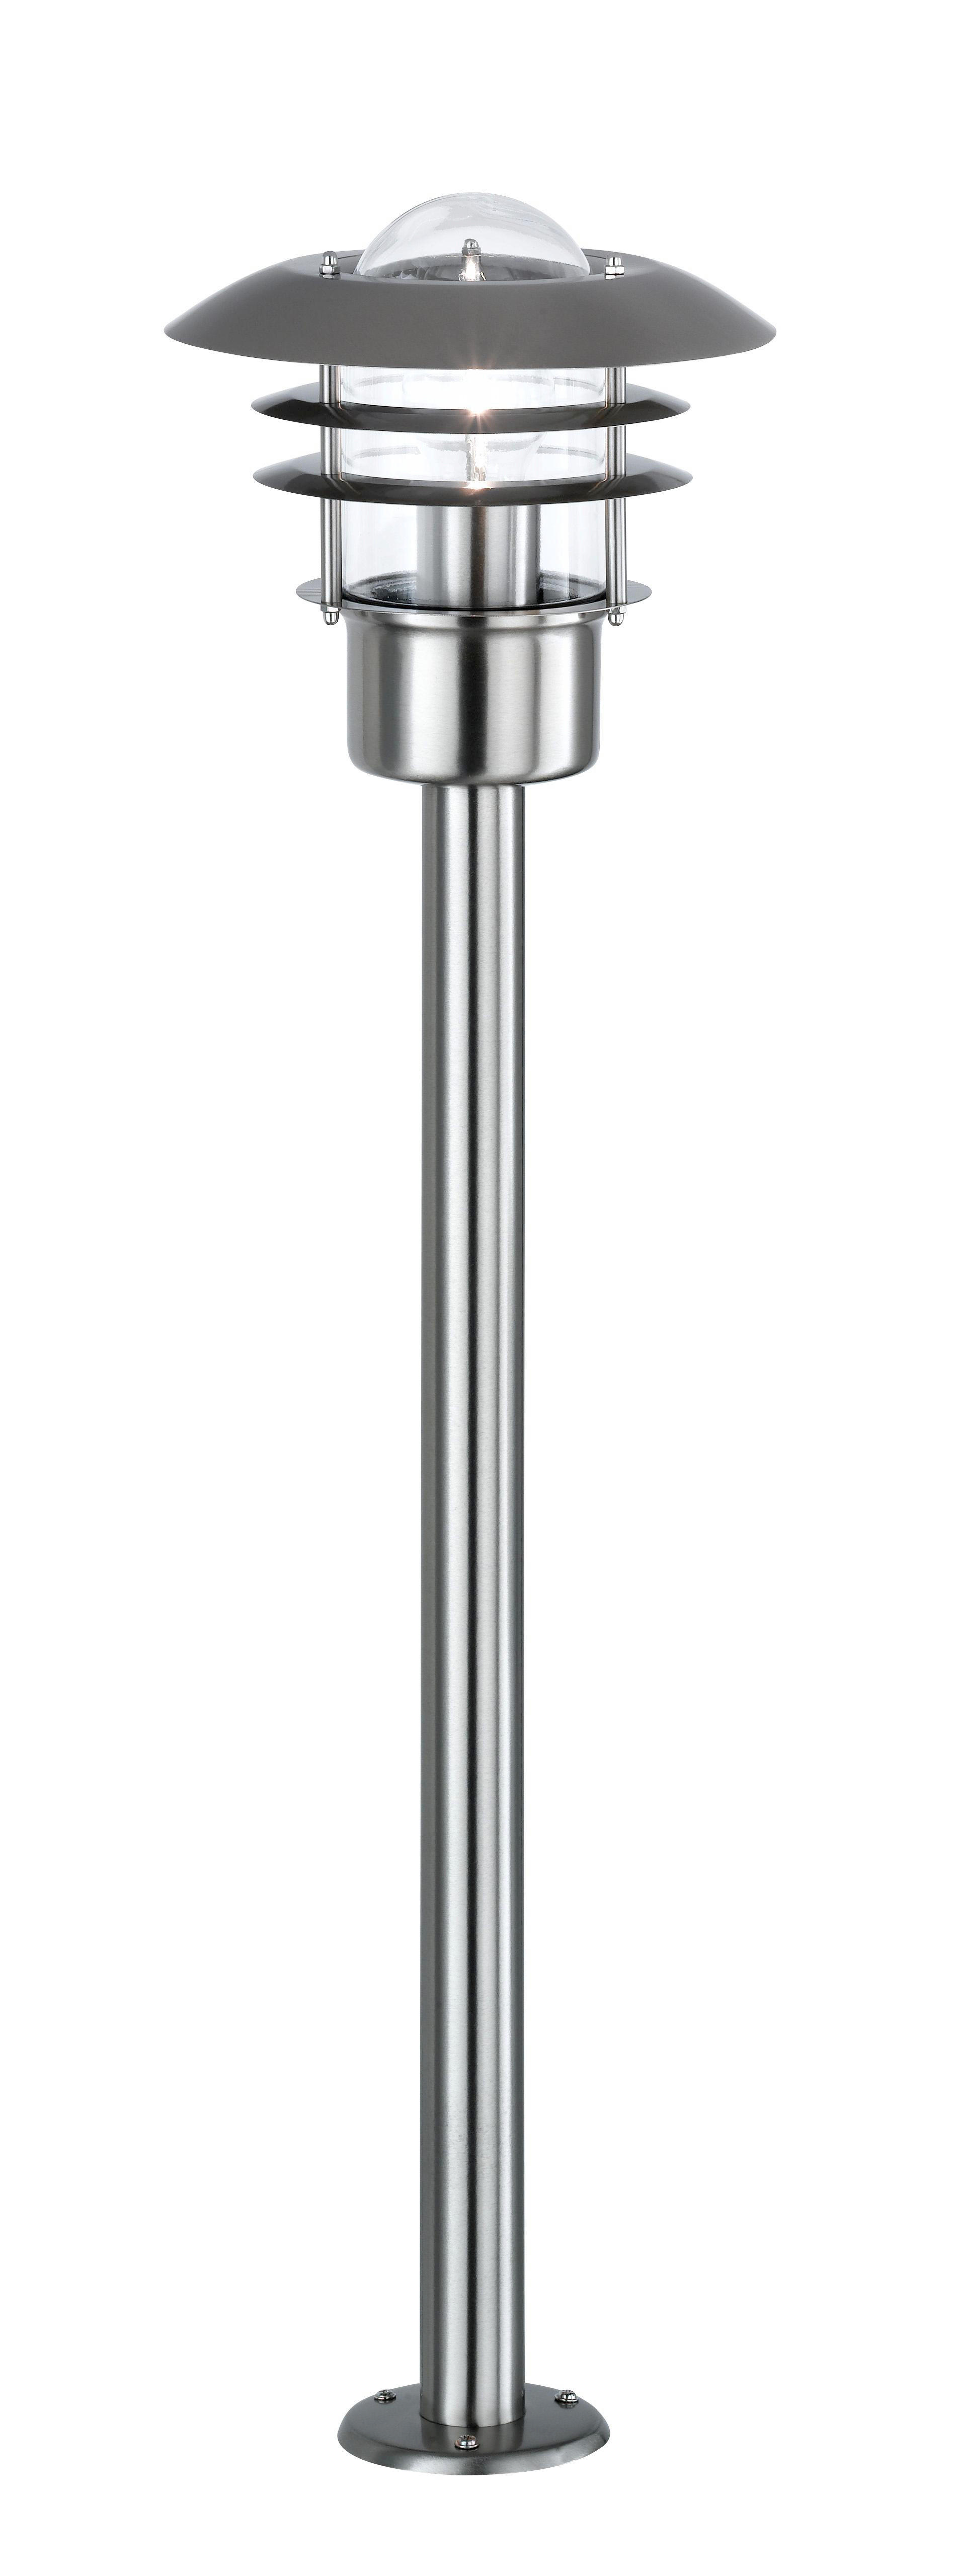 WEGELEUCHTE - Edelstahlfarben, Design, Metall (22/80cm)